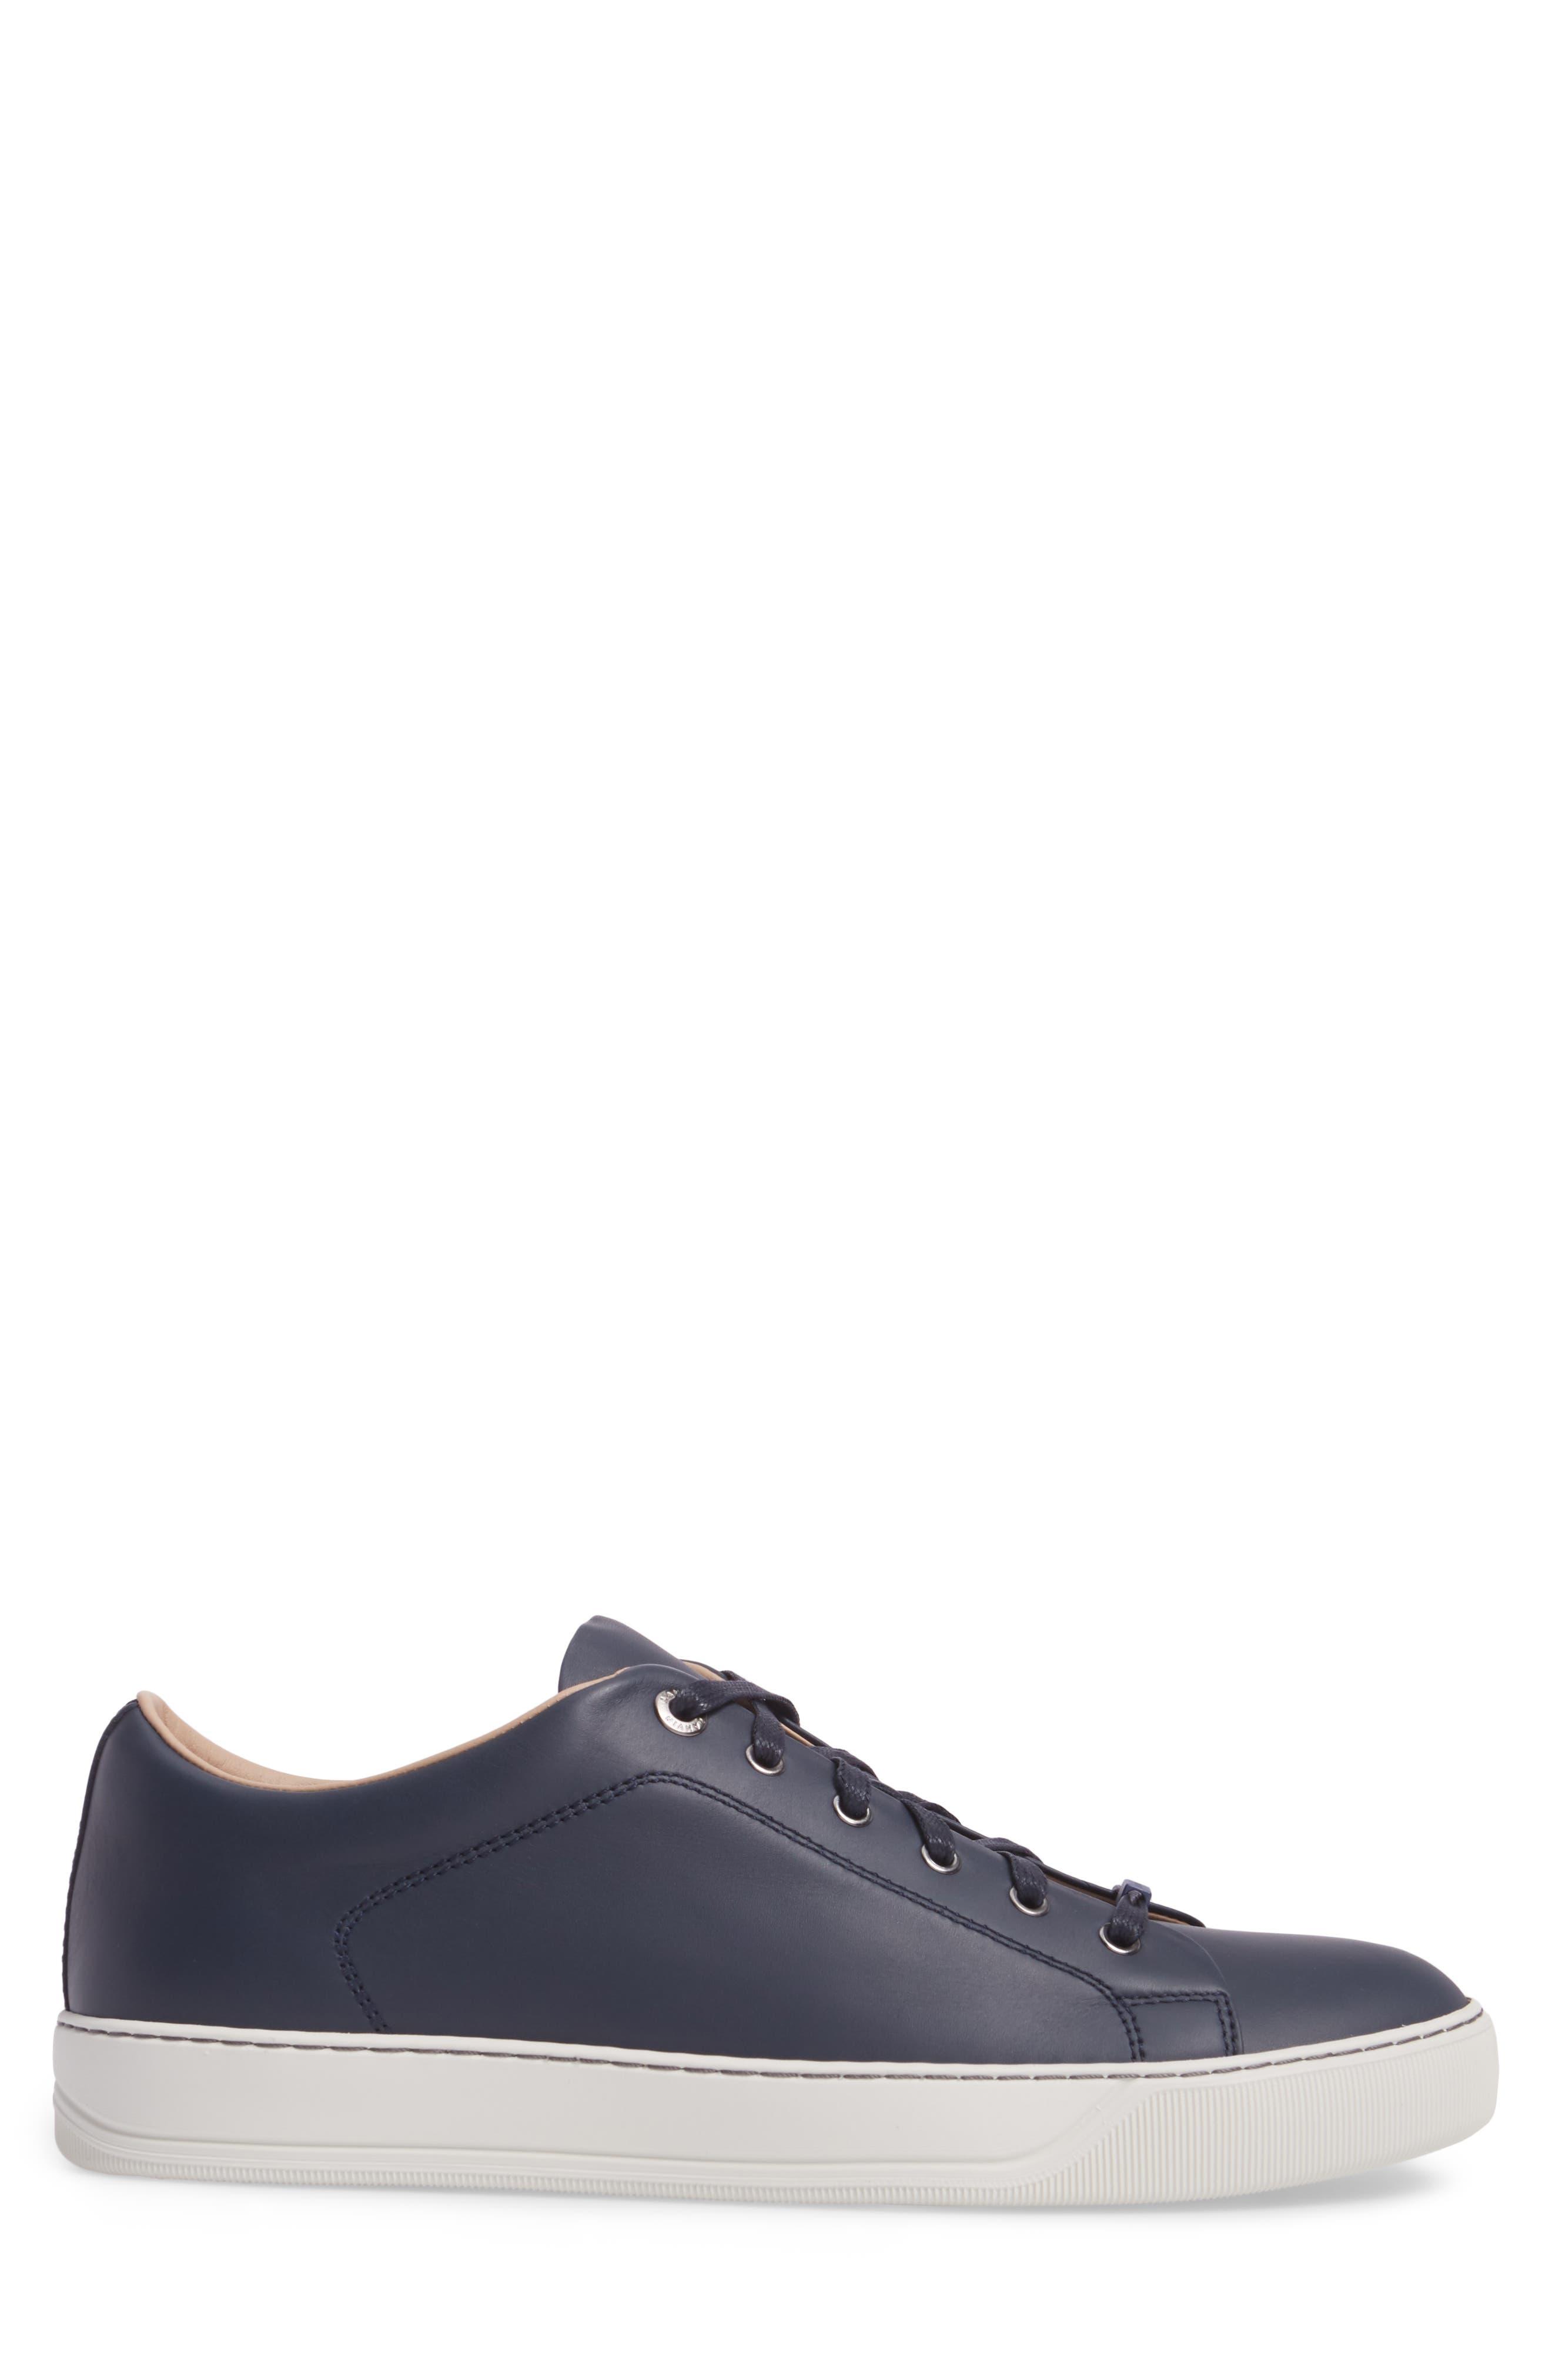 Alternate Image 3  - Lanvin Frye Nappa Sneaker (Men)